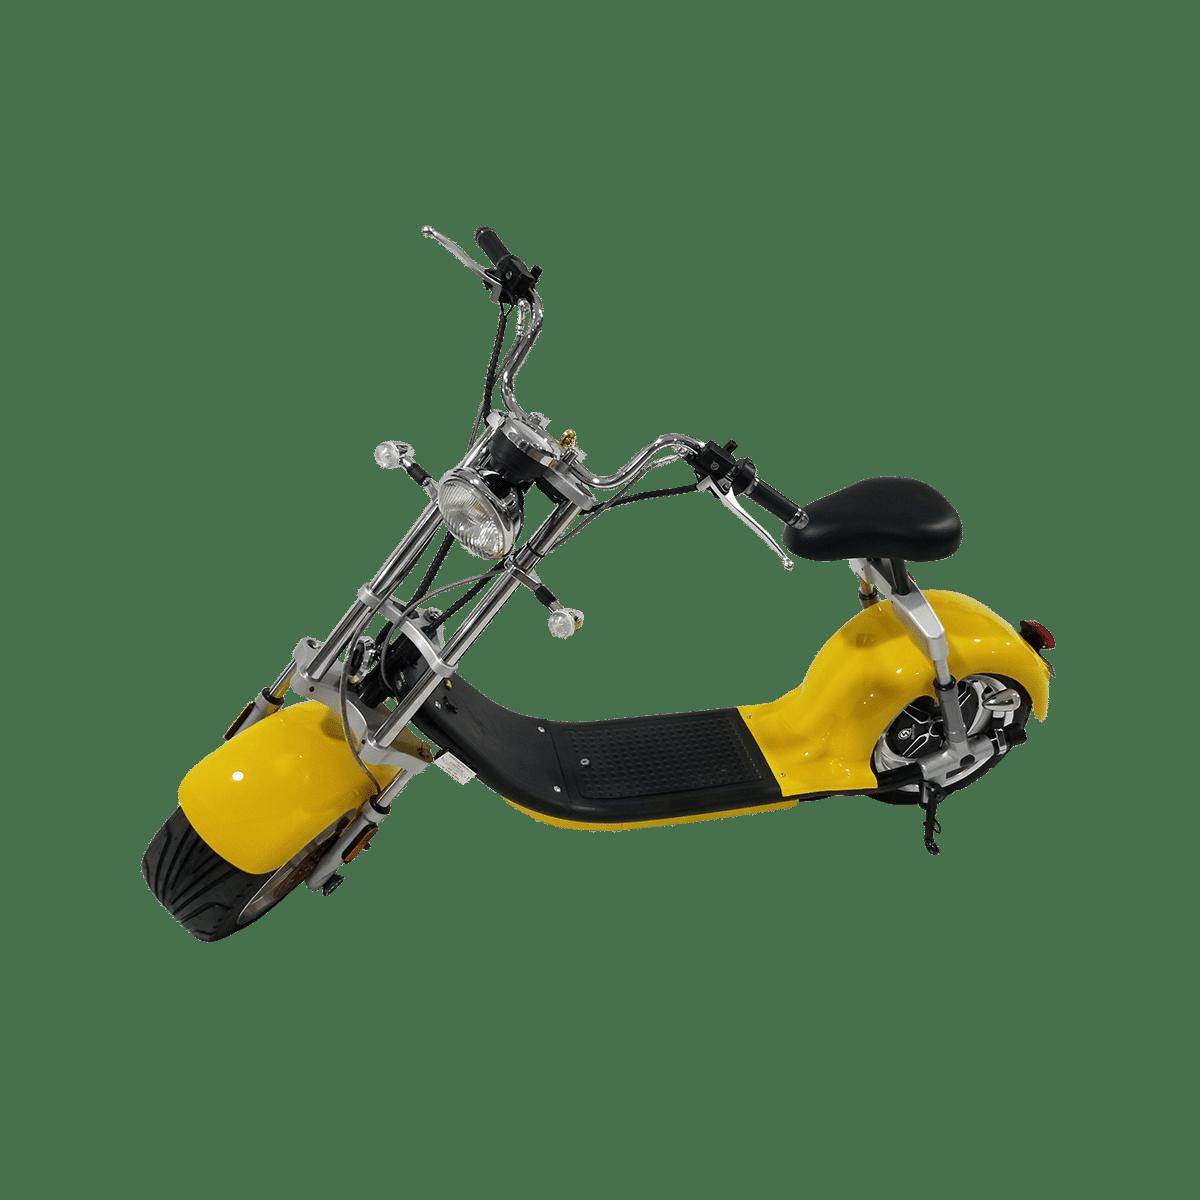 Citycoco Harley Deluxe Jaune avec 1 batterie offerte en plus 20